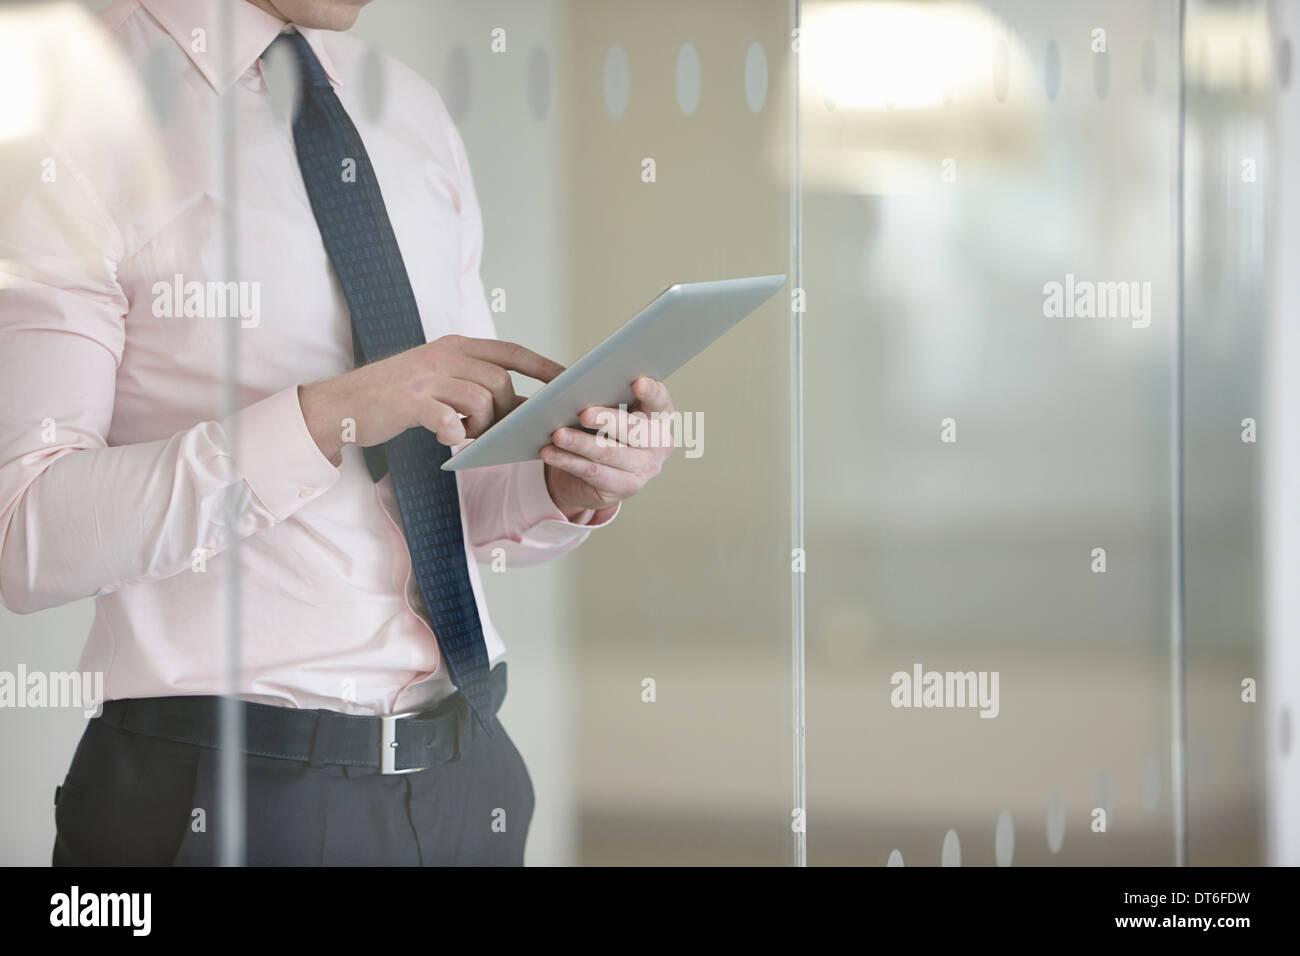 Imprenditore emis sione di tavoletta digitale Immagini Stock